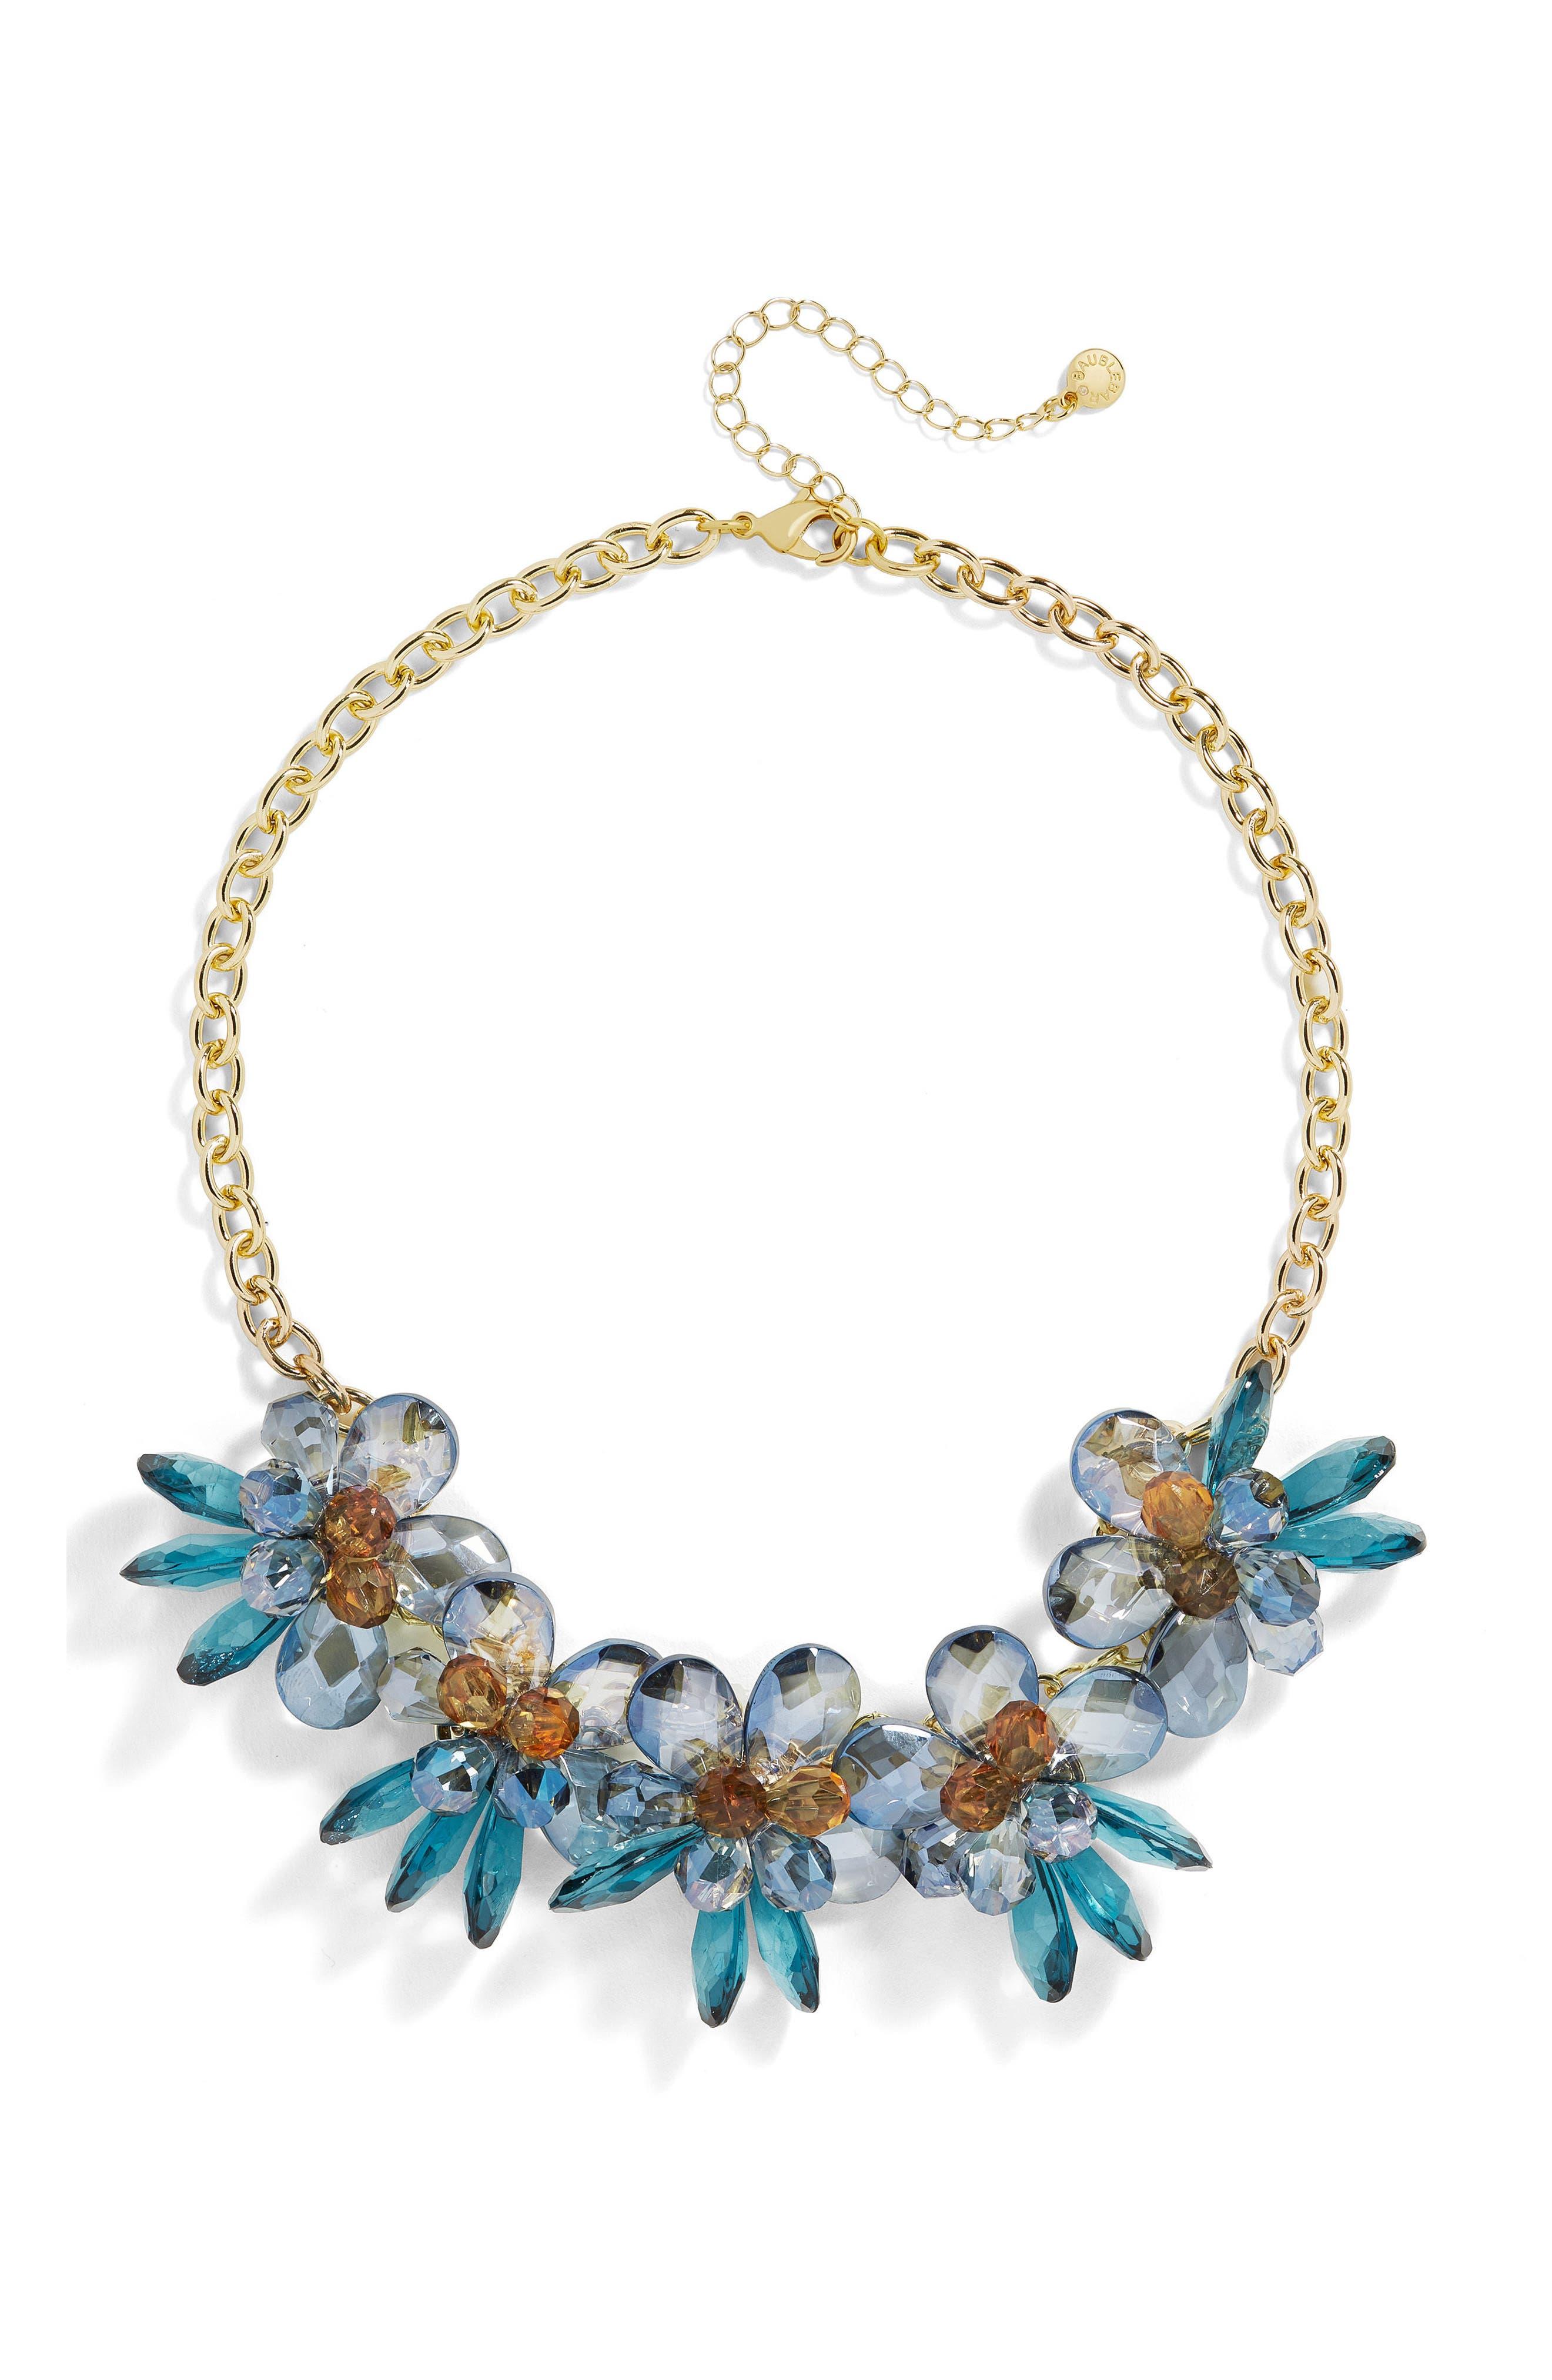 Main Image - BaubleBar Crystalline Large Flower Statement Necklace